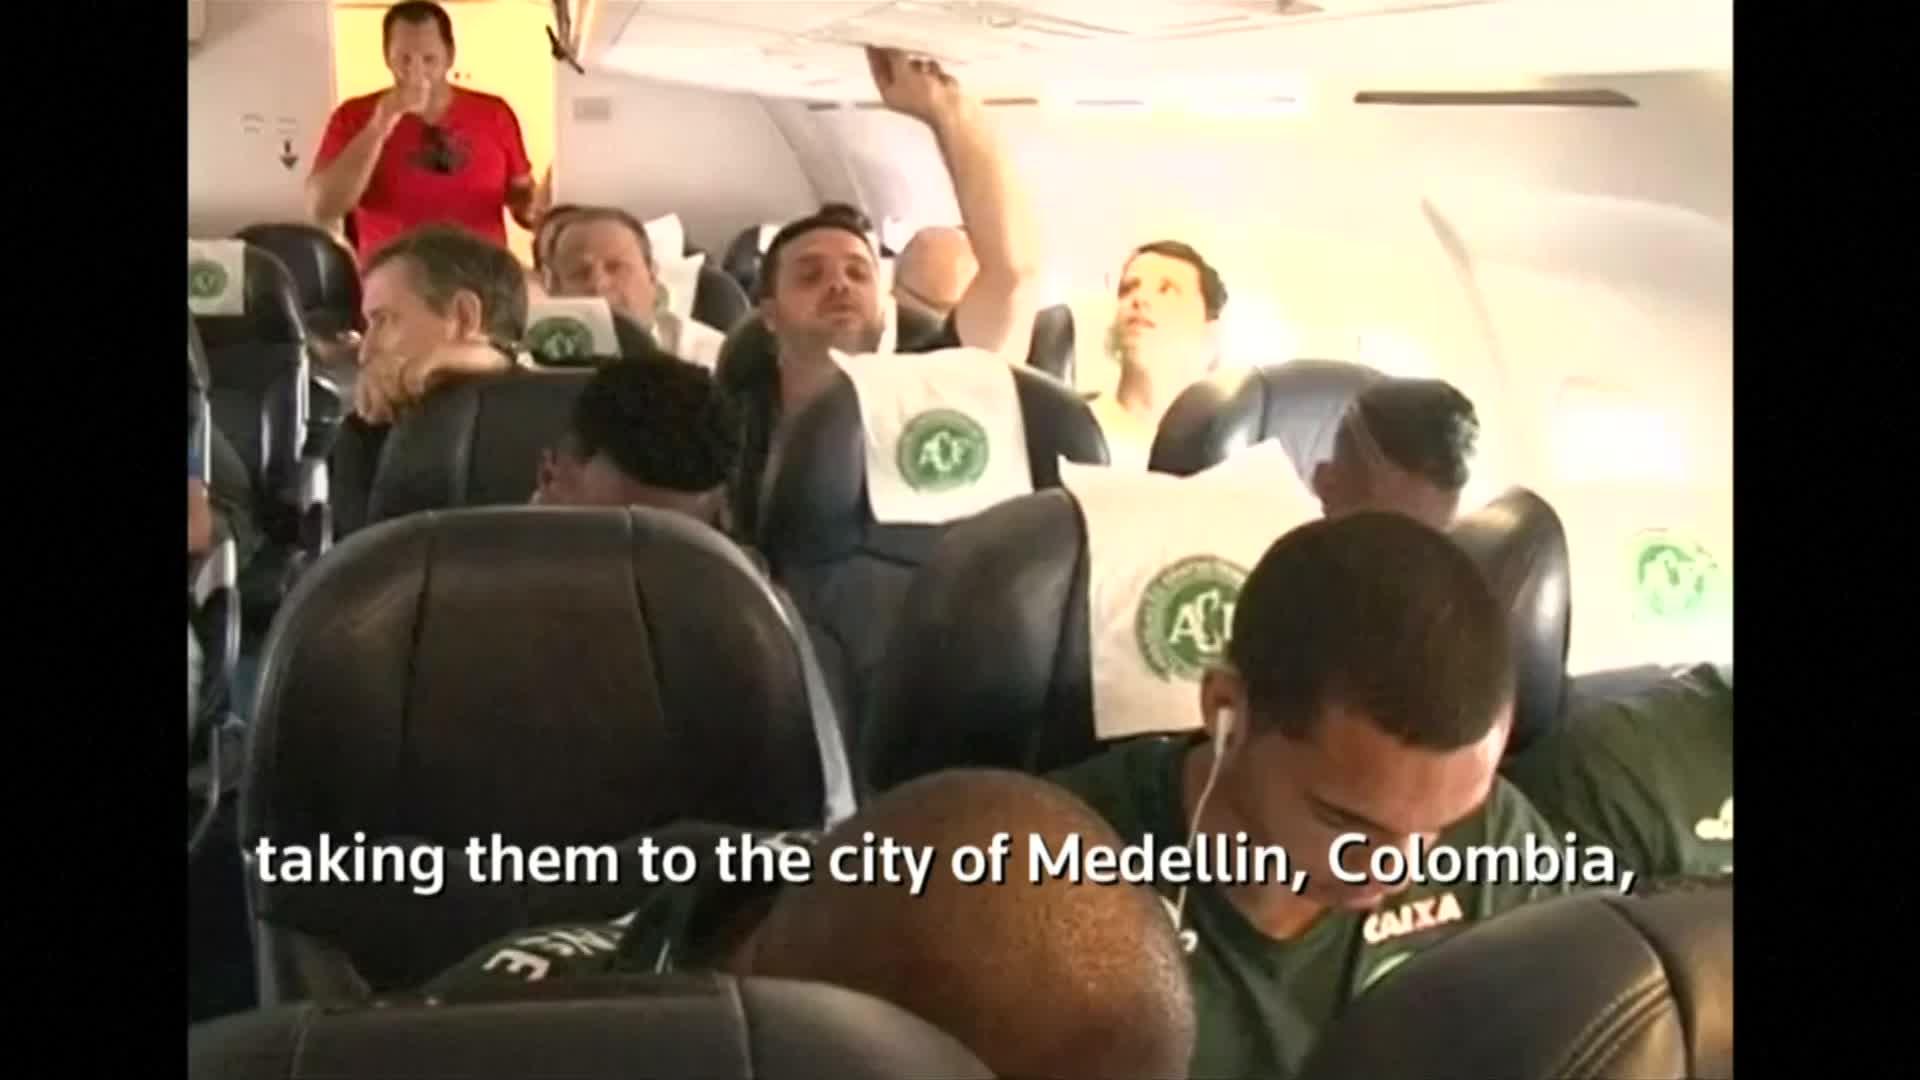 Chapecoense Plane Crash: Final Words Of Pilot